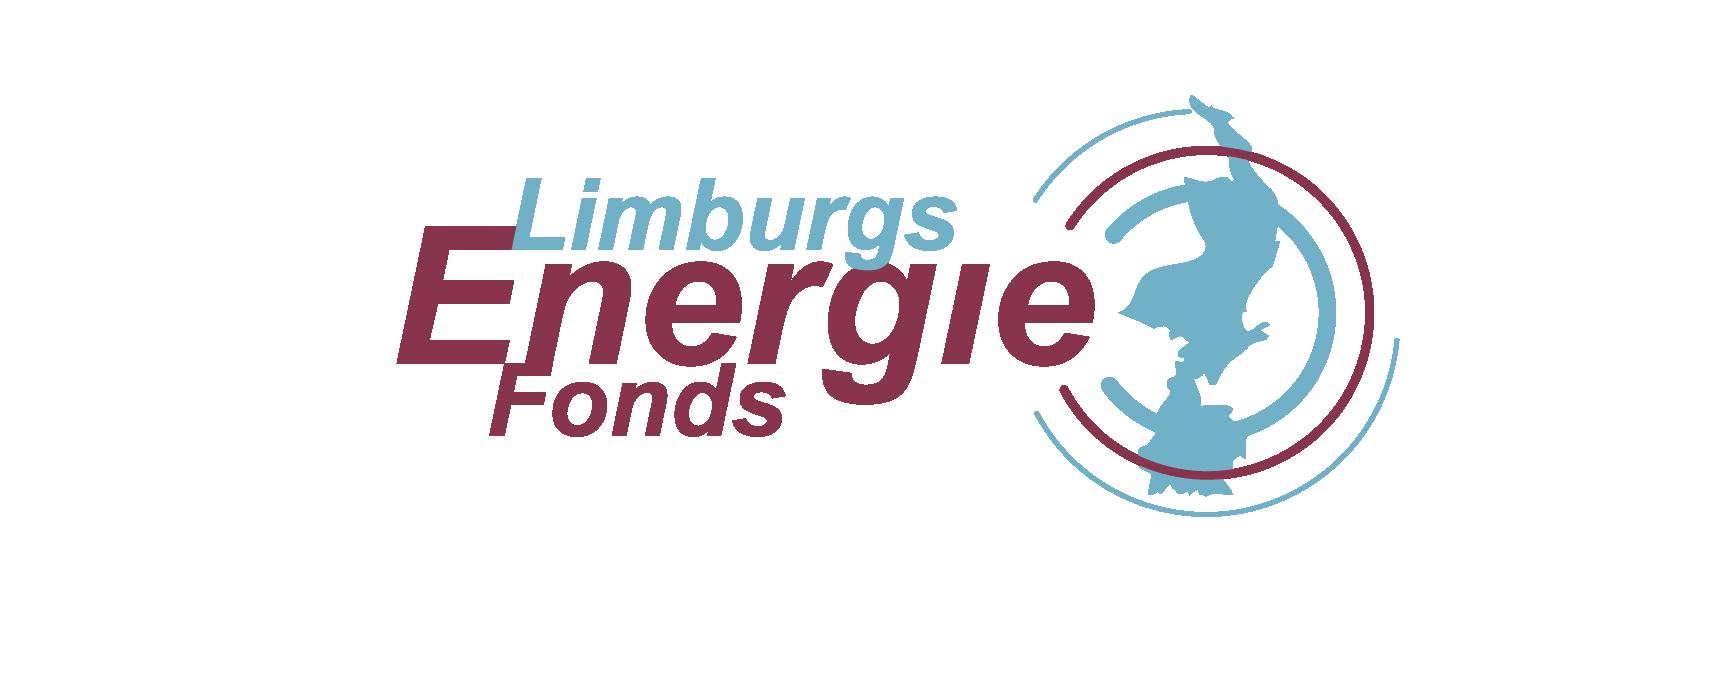 limburgs energie fonds